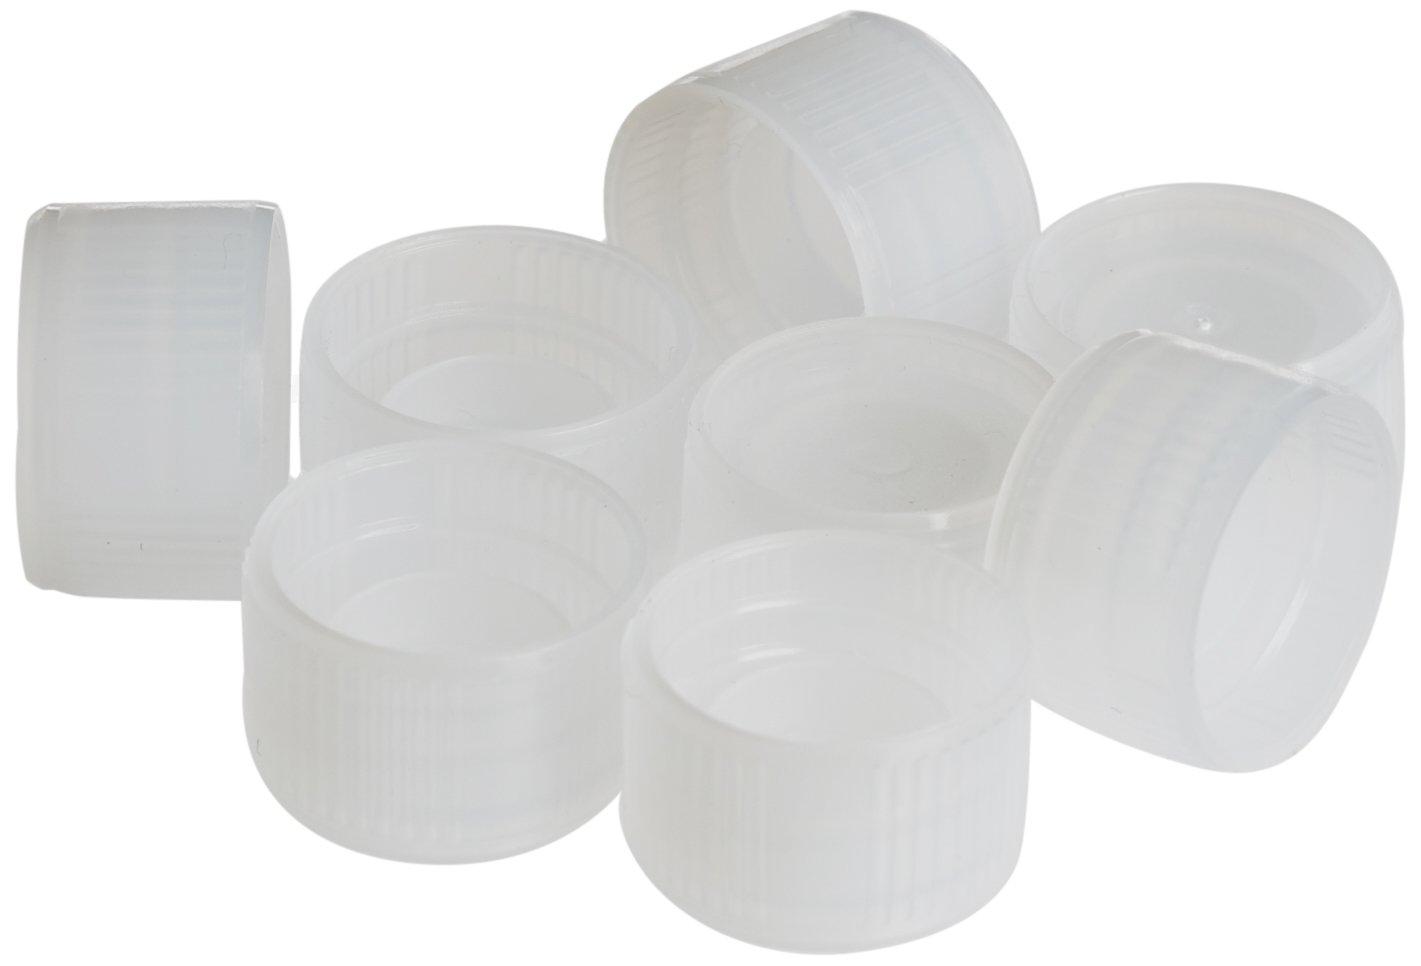 neoLab 7-4540 Schraubverschlü sse, Transparent (1000-er Pack)